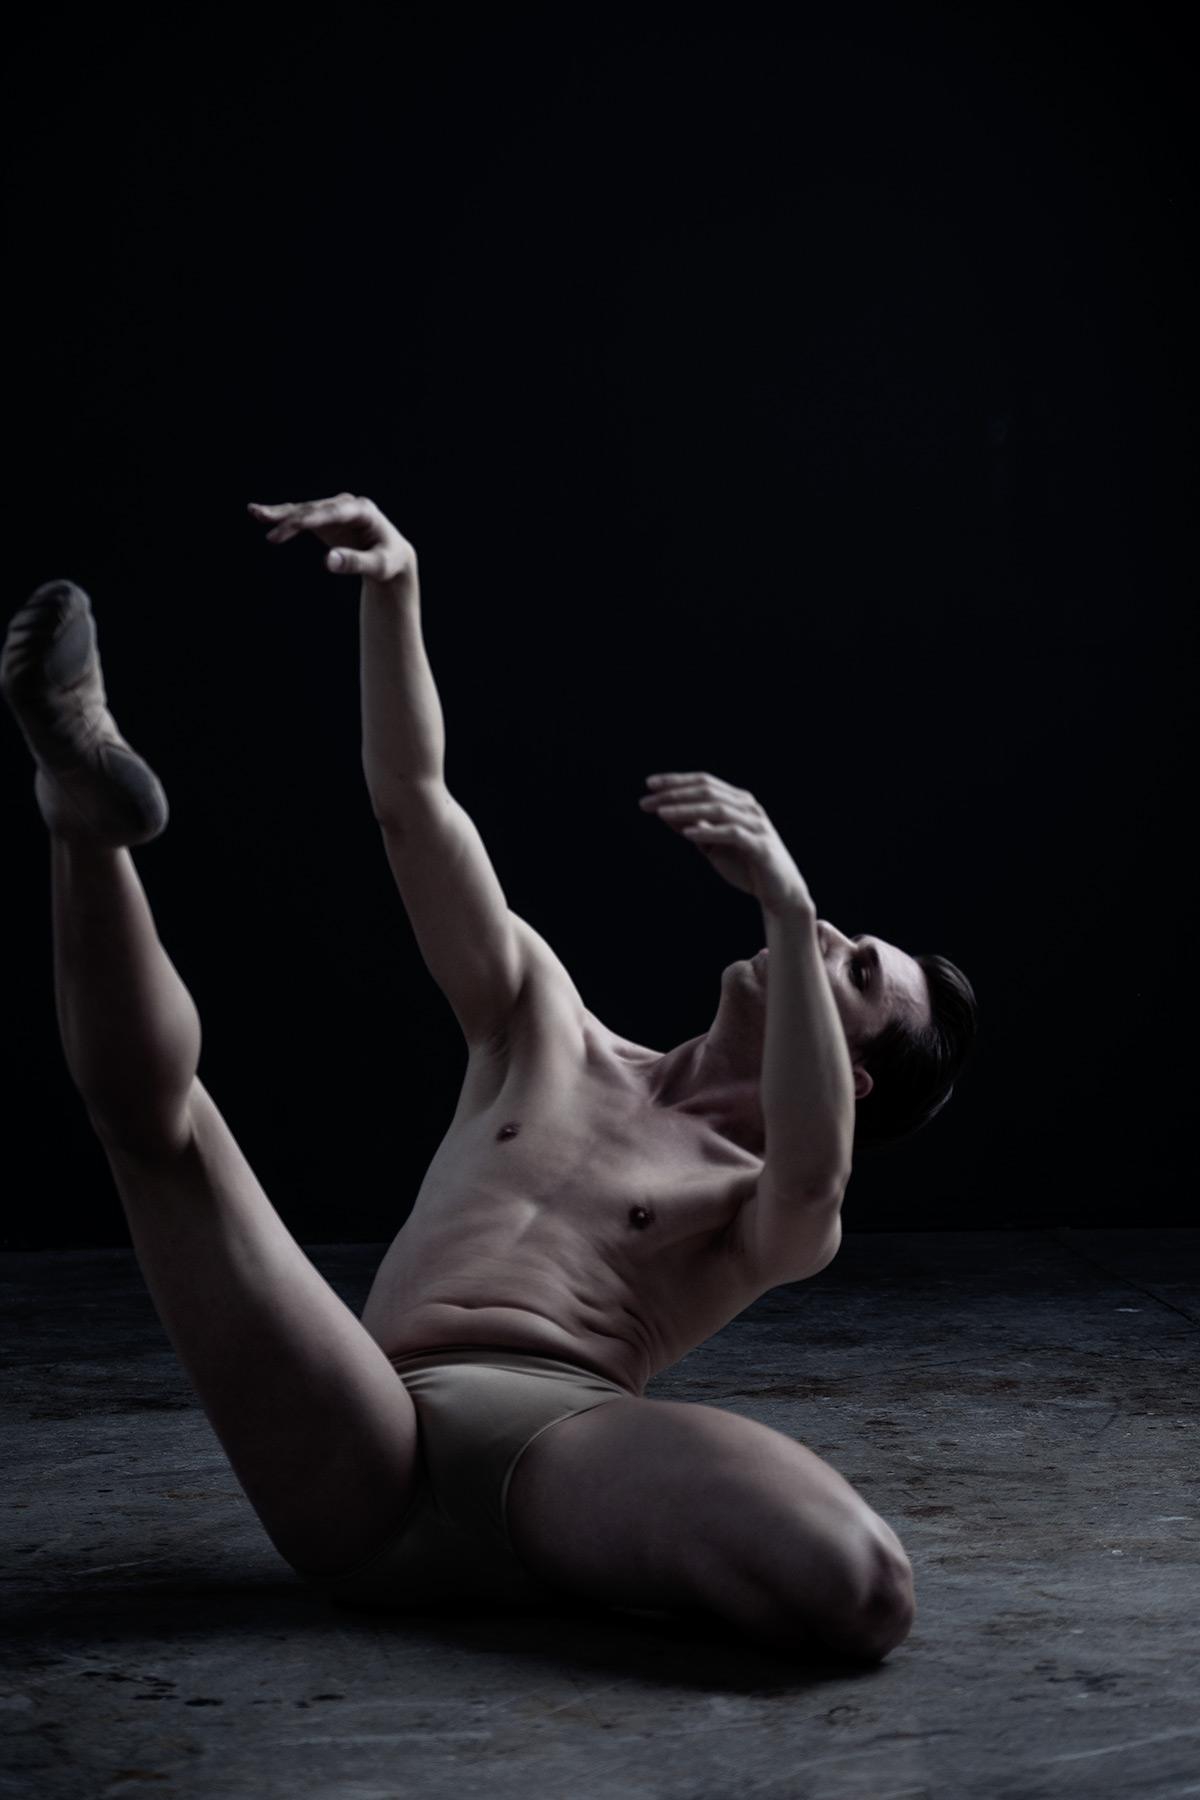 Shaughn Pegararo. National Dance Theatre of Australia. 2018